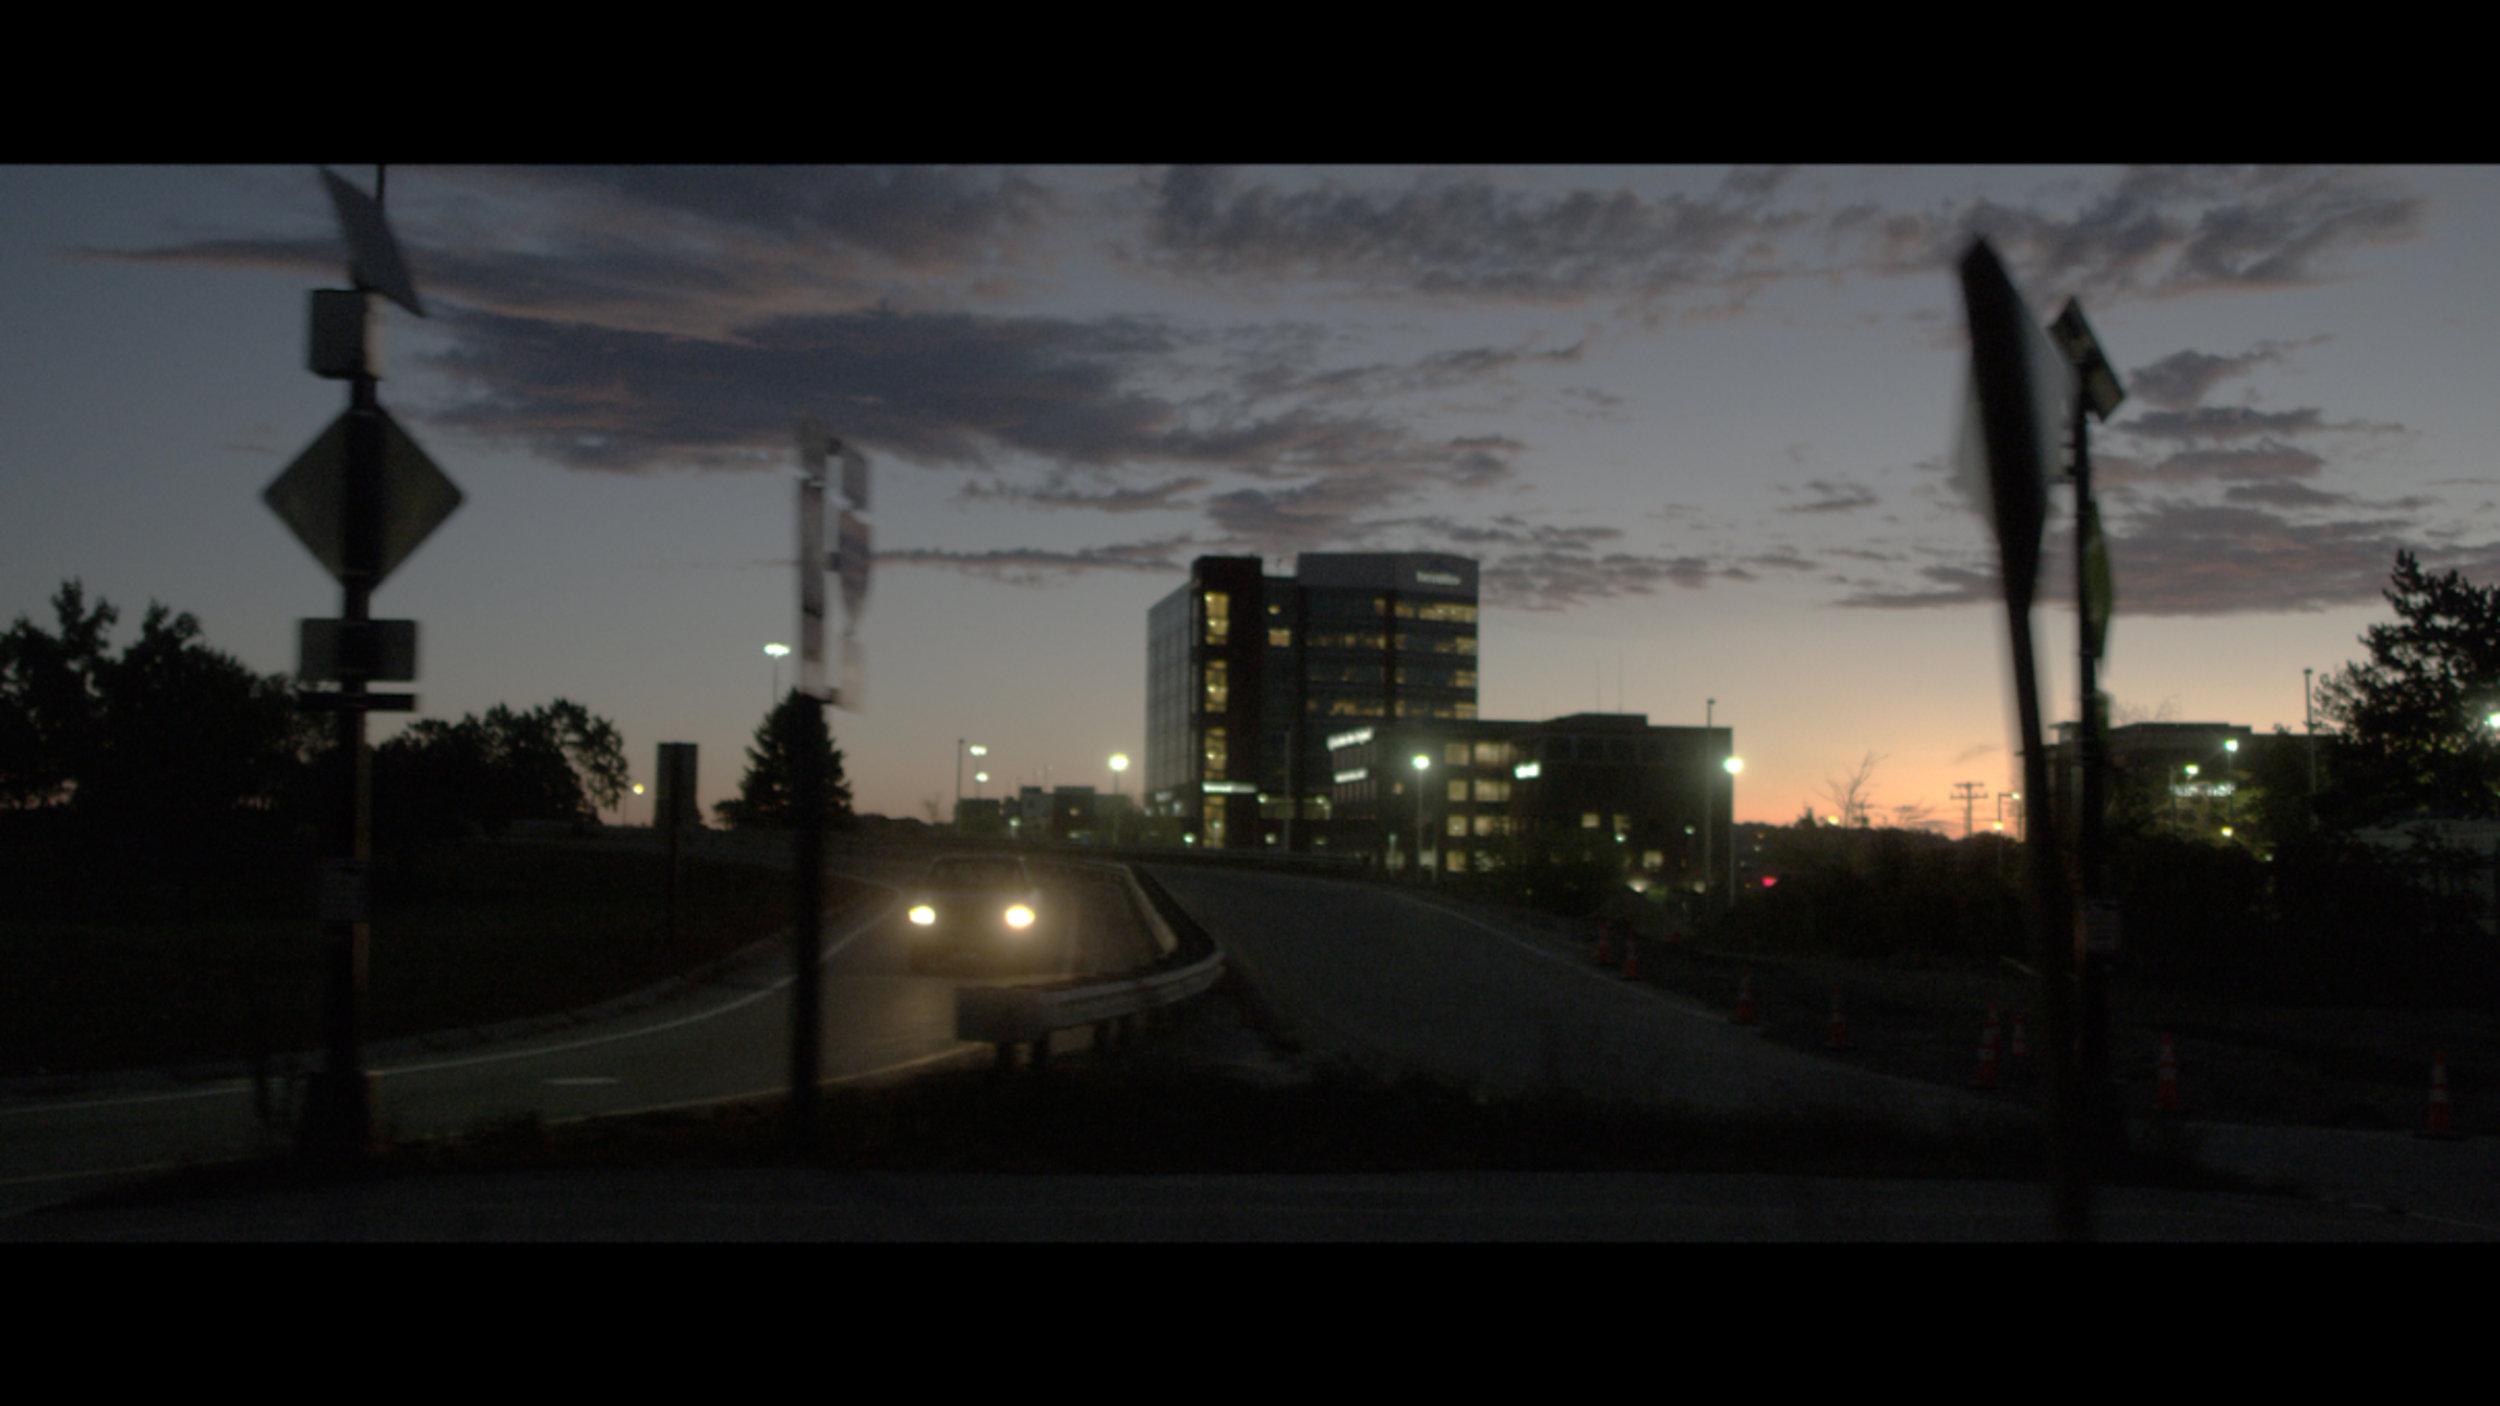 Screen Shot 2018-02-23 at 10.59.32 AM.jpg